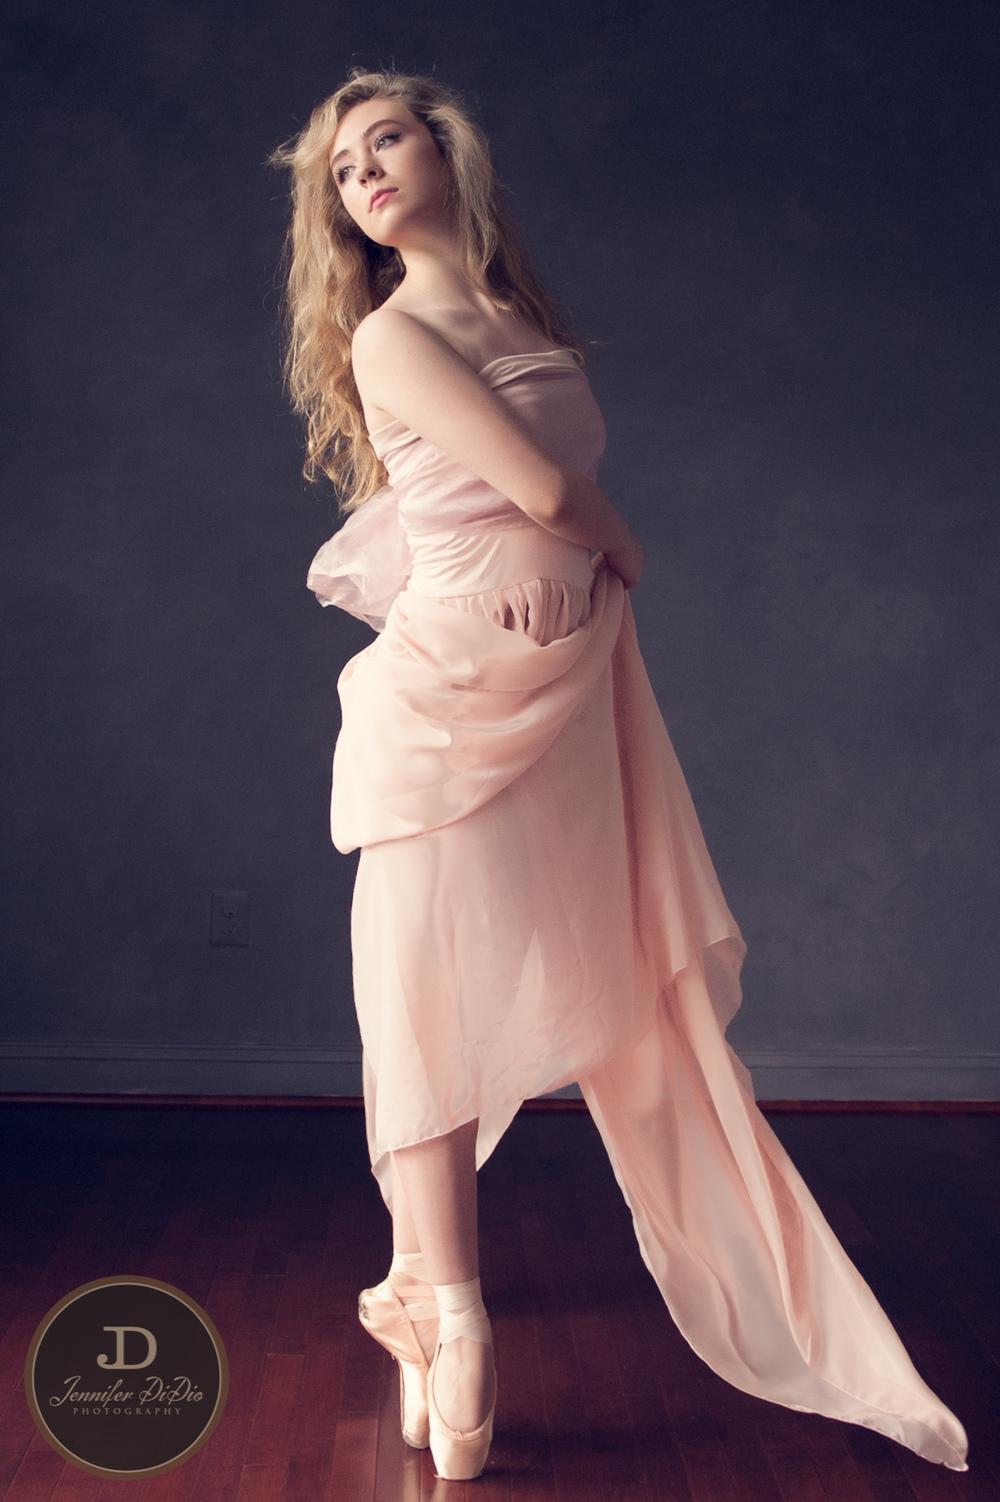 Jennifer.DiDio.Photography.Barnhill.Hayley.2014-136-Edit.jpg